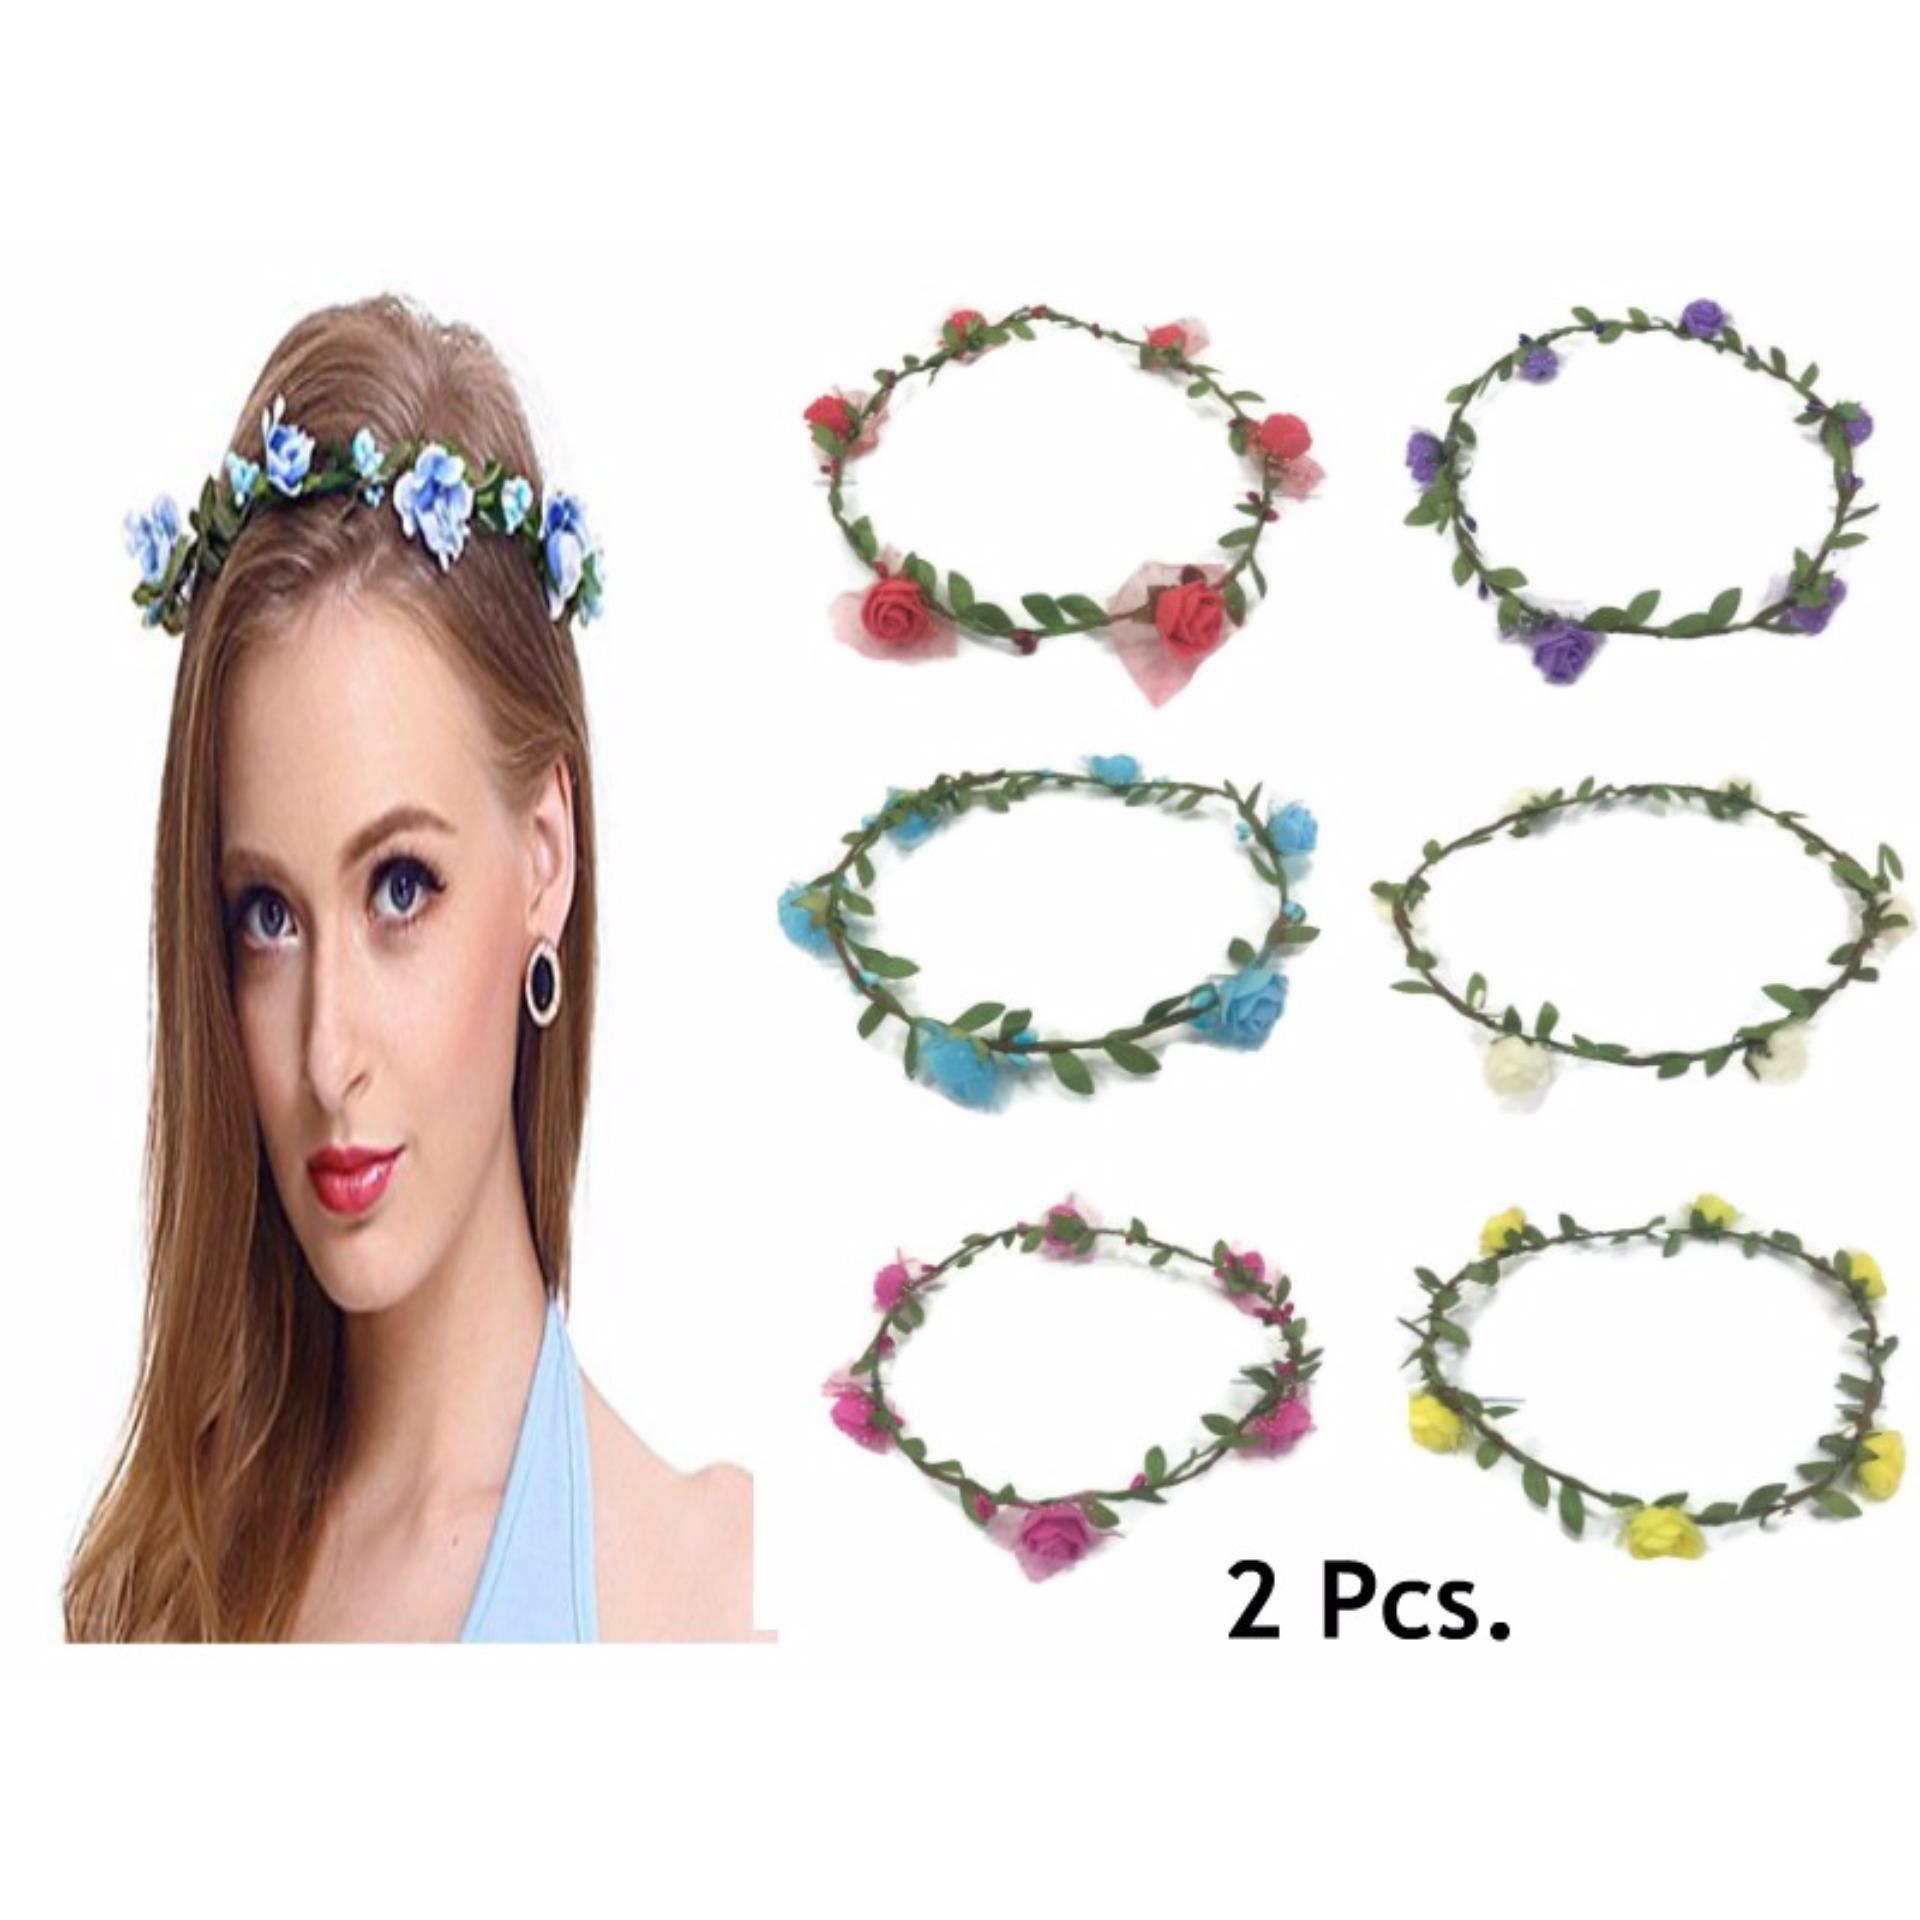 Philippines 2 pcs fairy flower crown headdress garland bridal 2 pcs fairy flower crown headdress garland bridal head accessories 16g izmirmasajfo